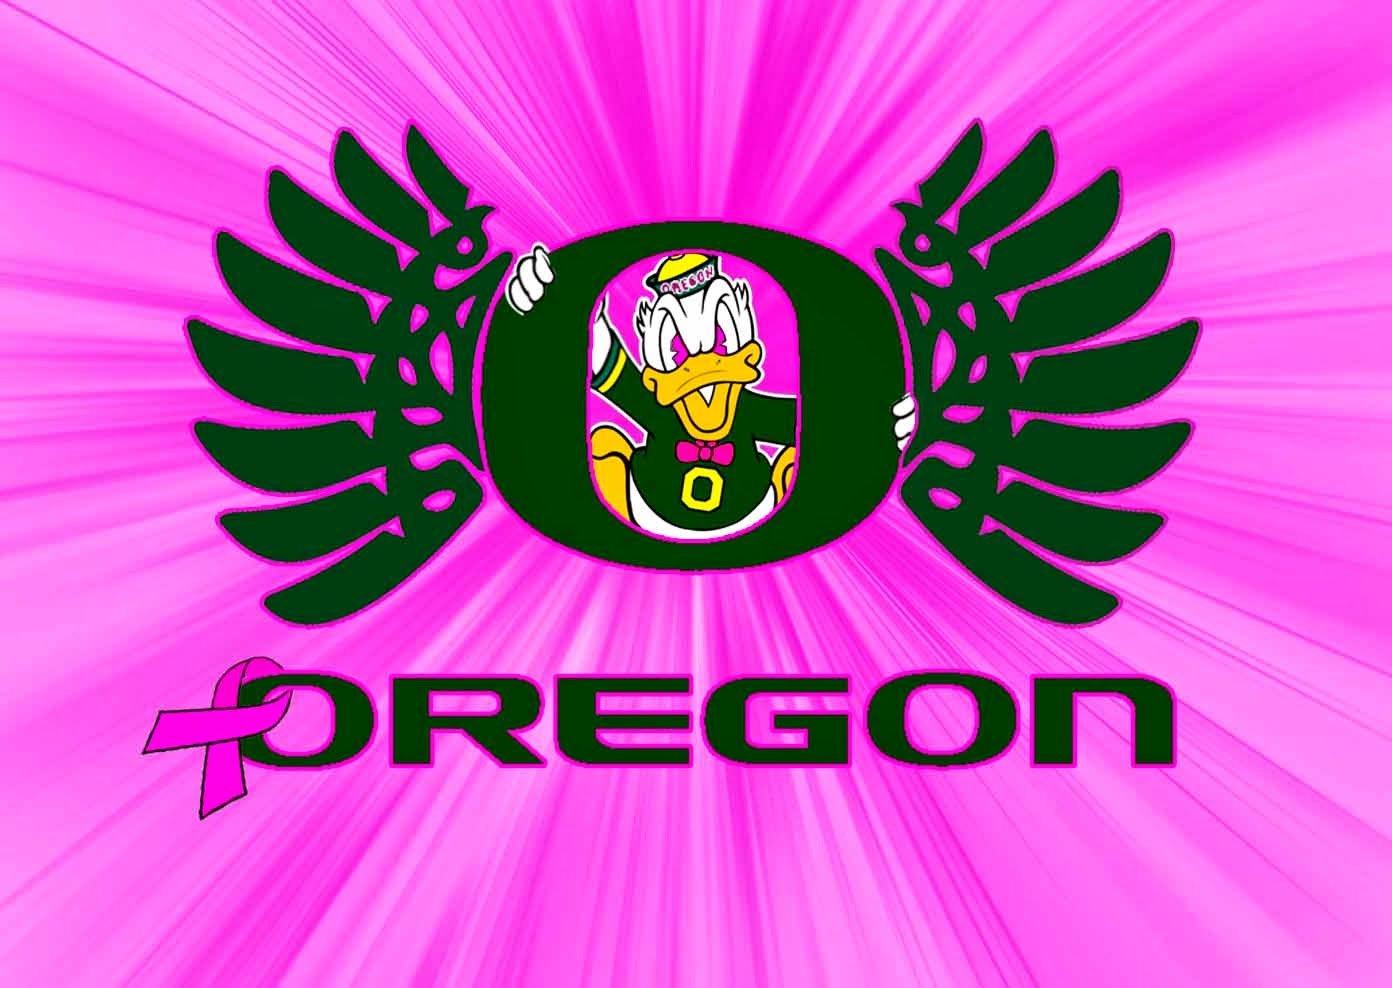 Oregon Ducks Logo With 1392x988